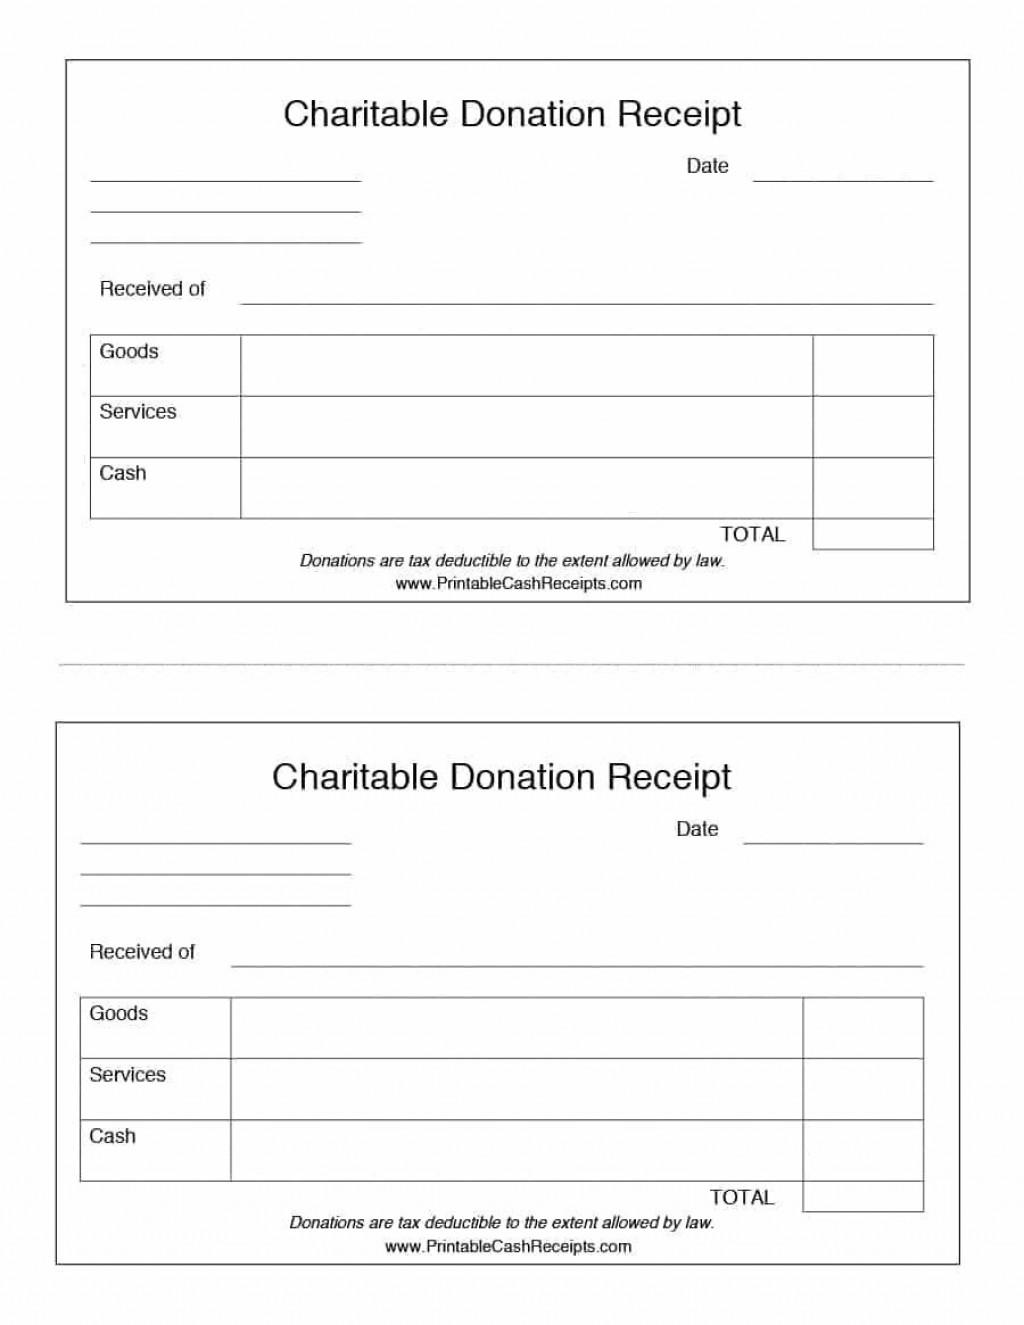 000 Shocking Tax Deductible Donation Receipt Template Australia Sample Large